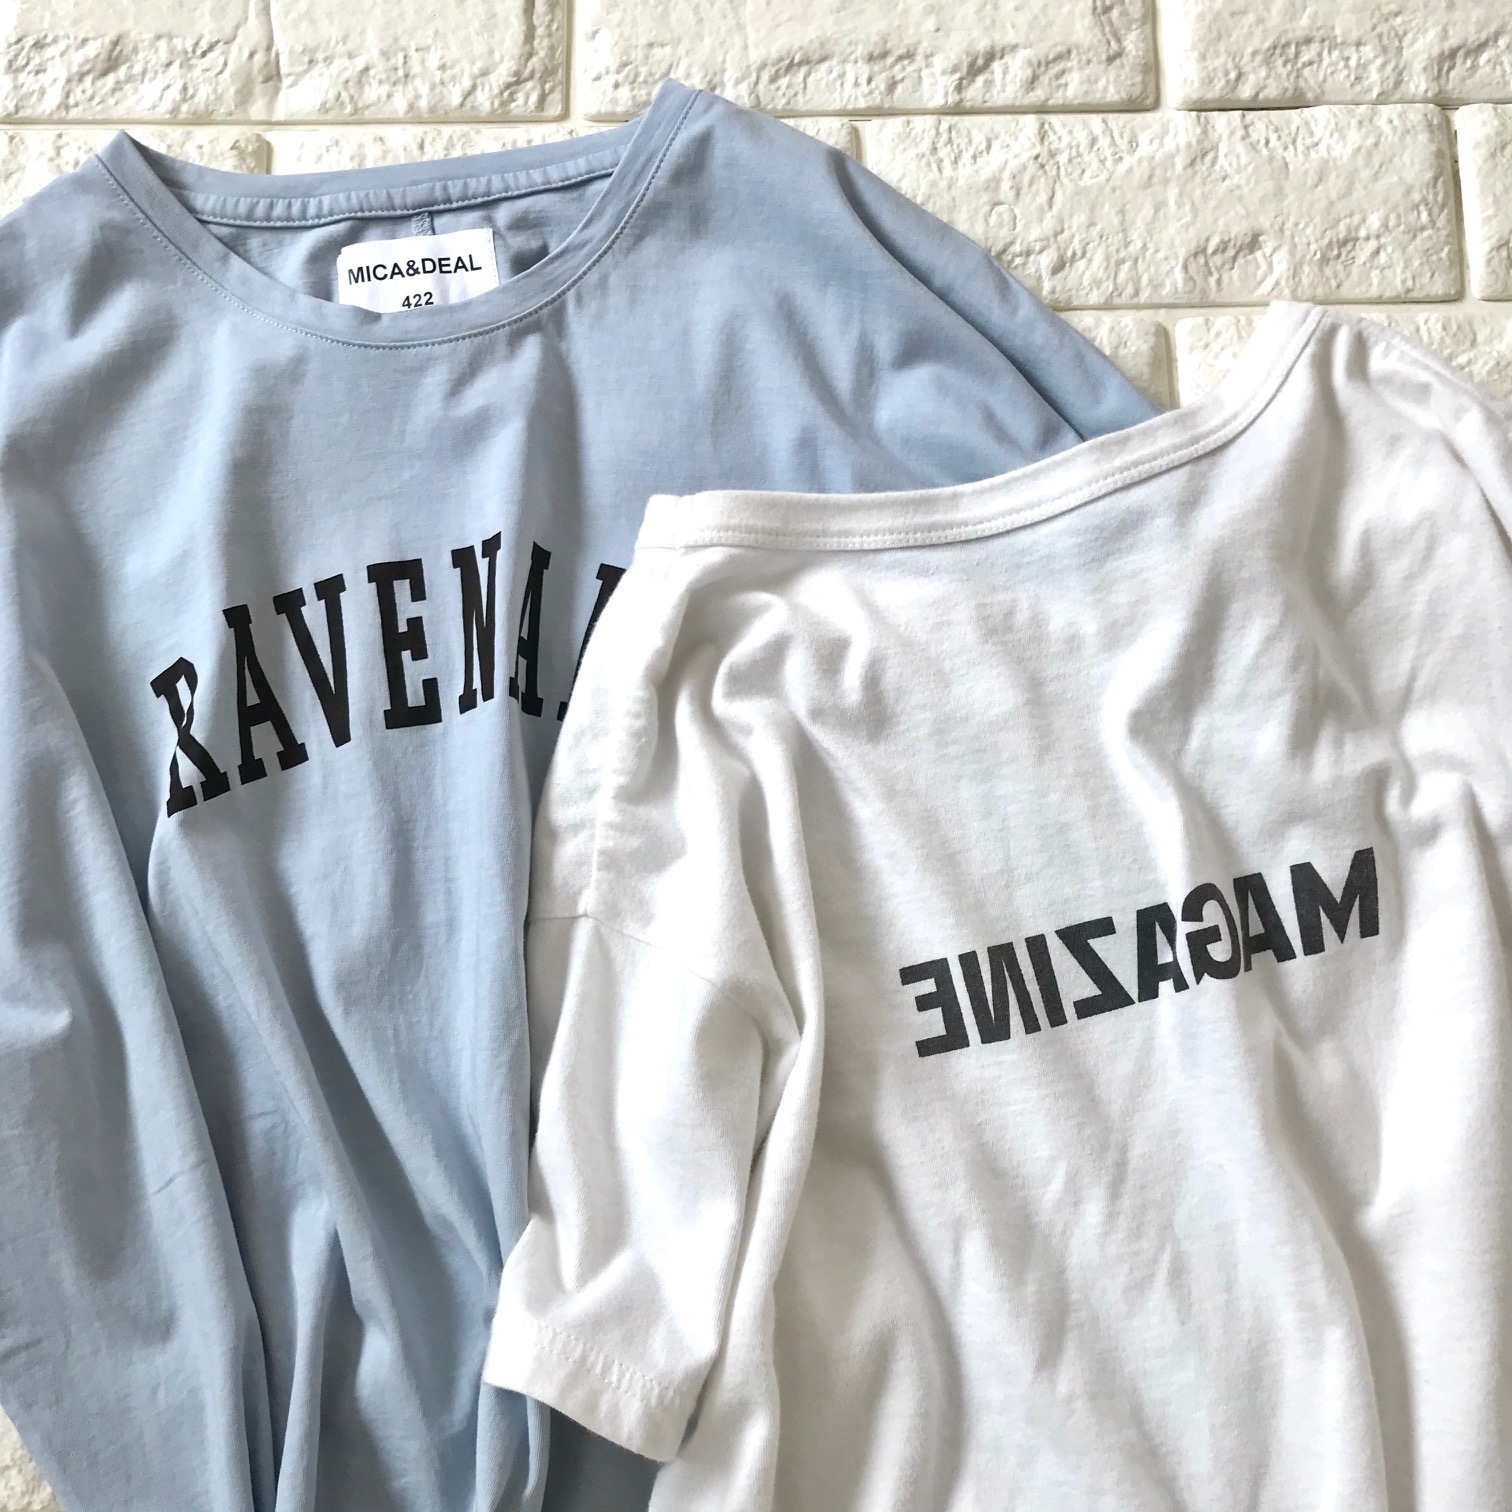 MICA&DEALのTシャツとサードマガジンのTシャツ並列画像